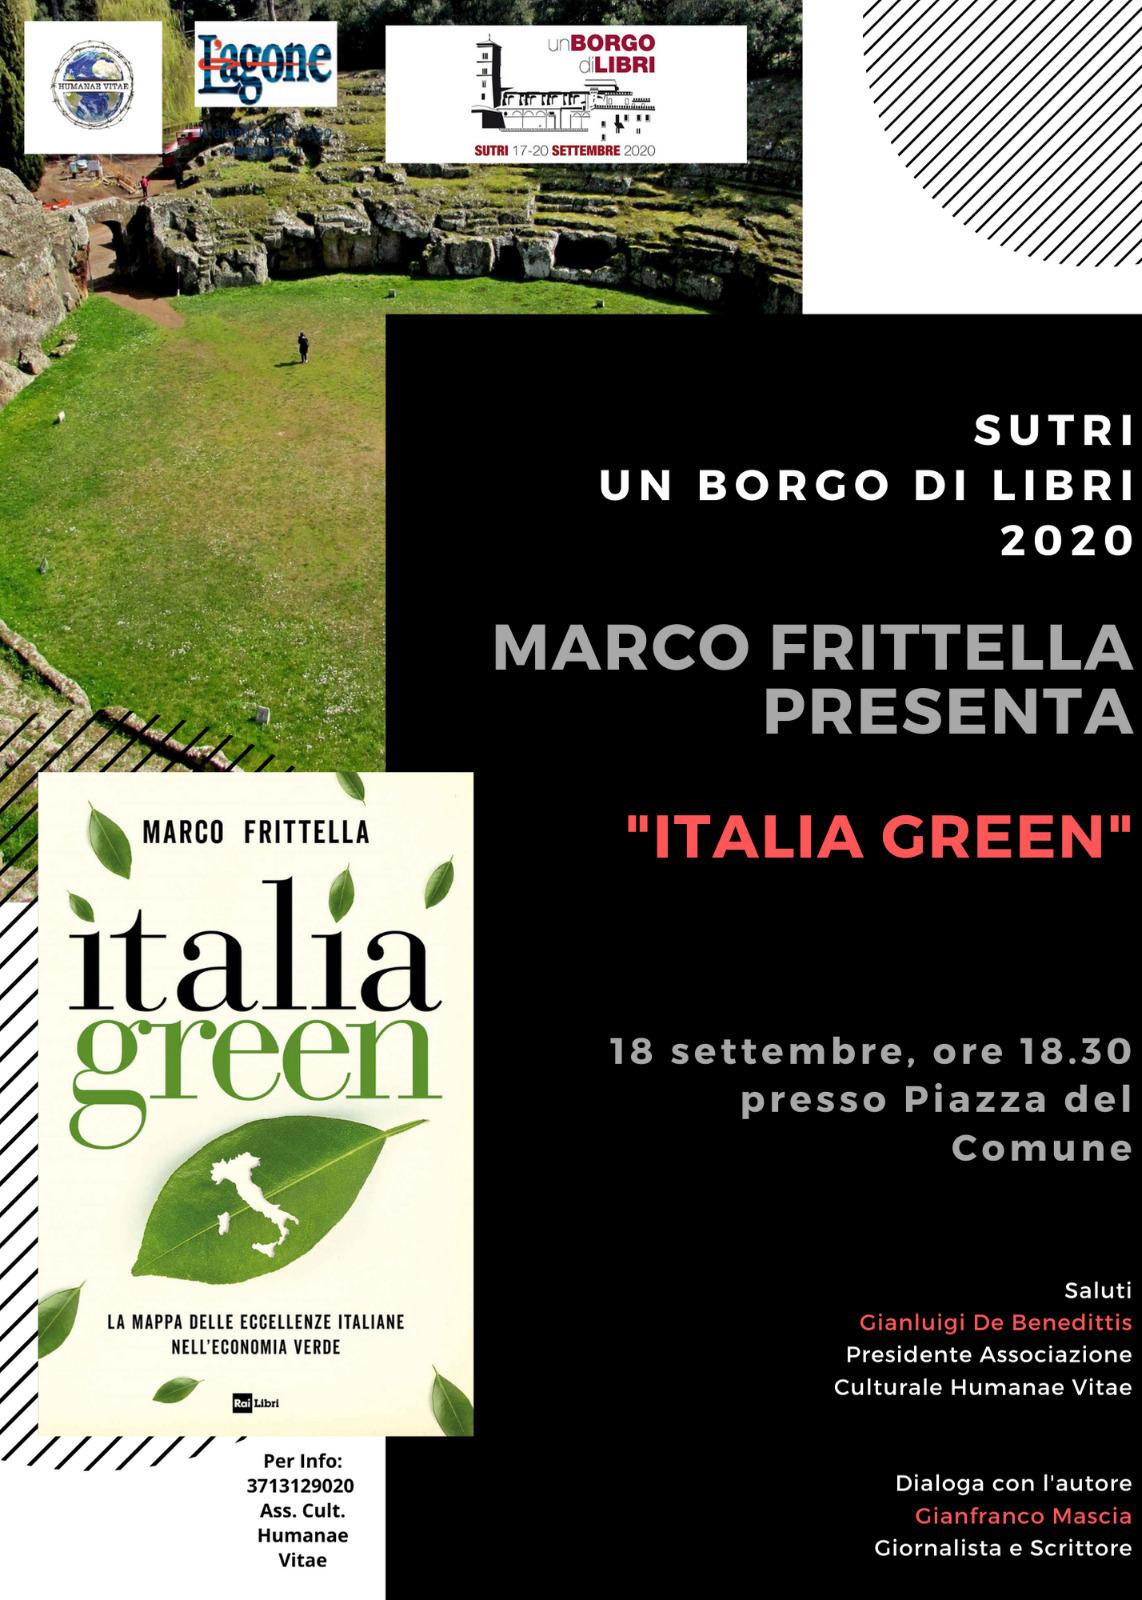 Marco Frittella presenta ITALIA GREEN